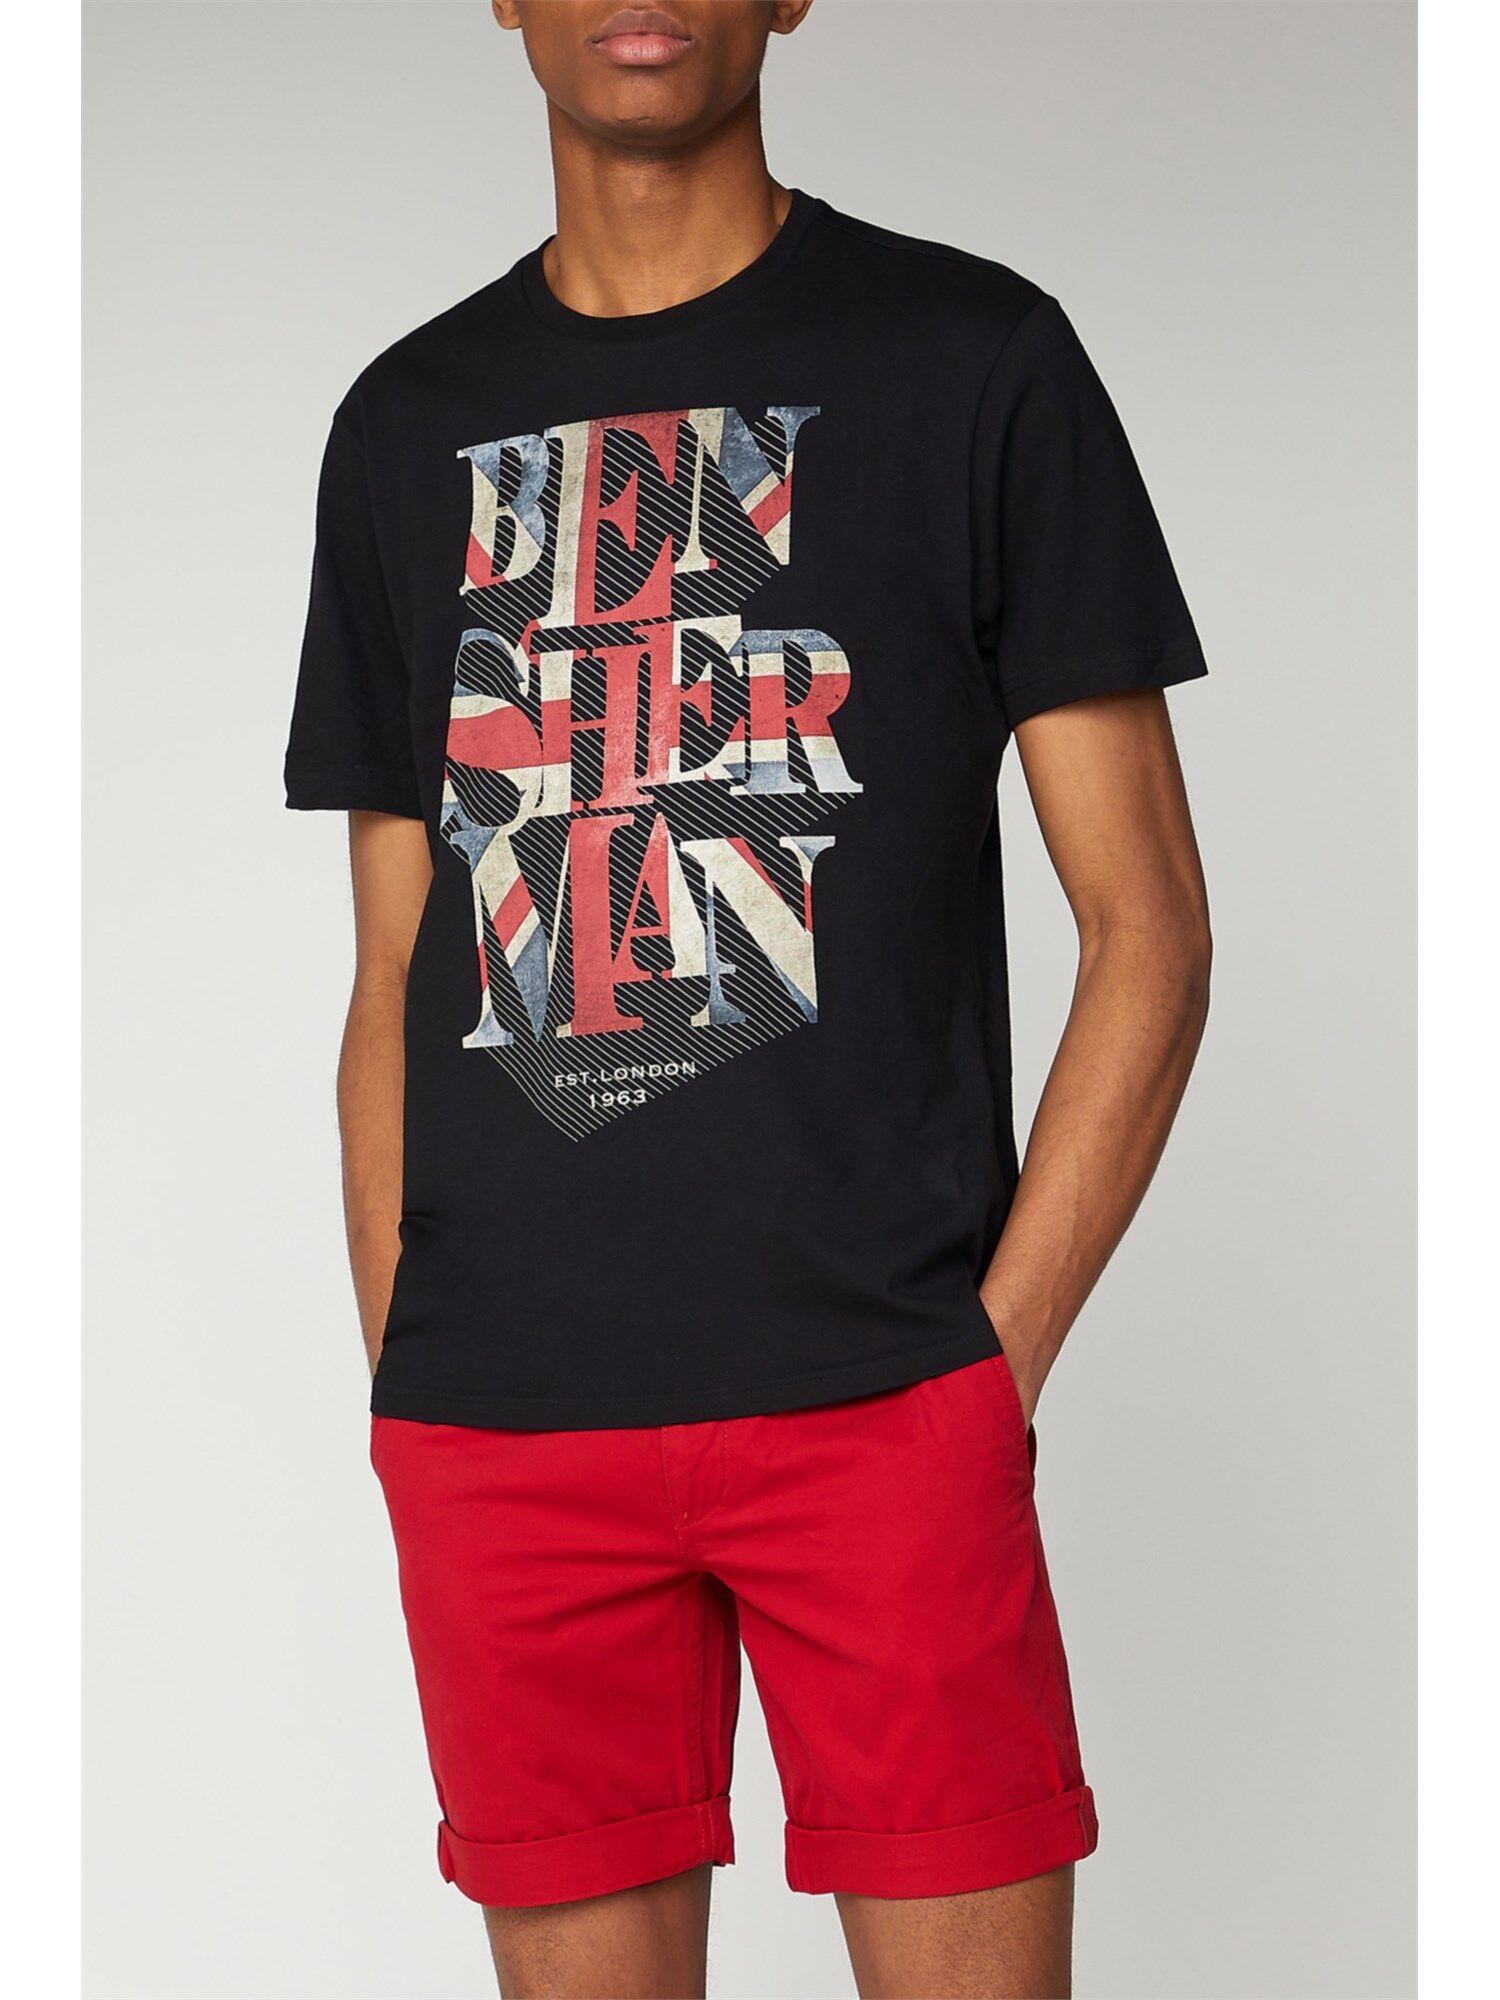 Ben Sherman Union Jack Graphic T-Shirt Sml Black